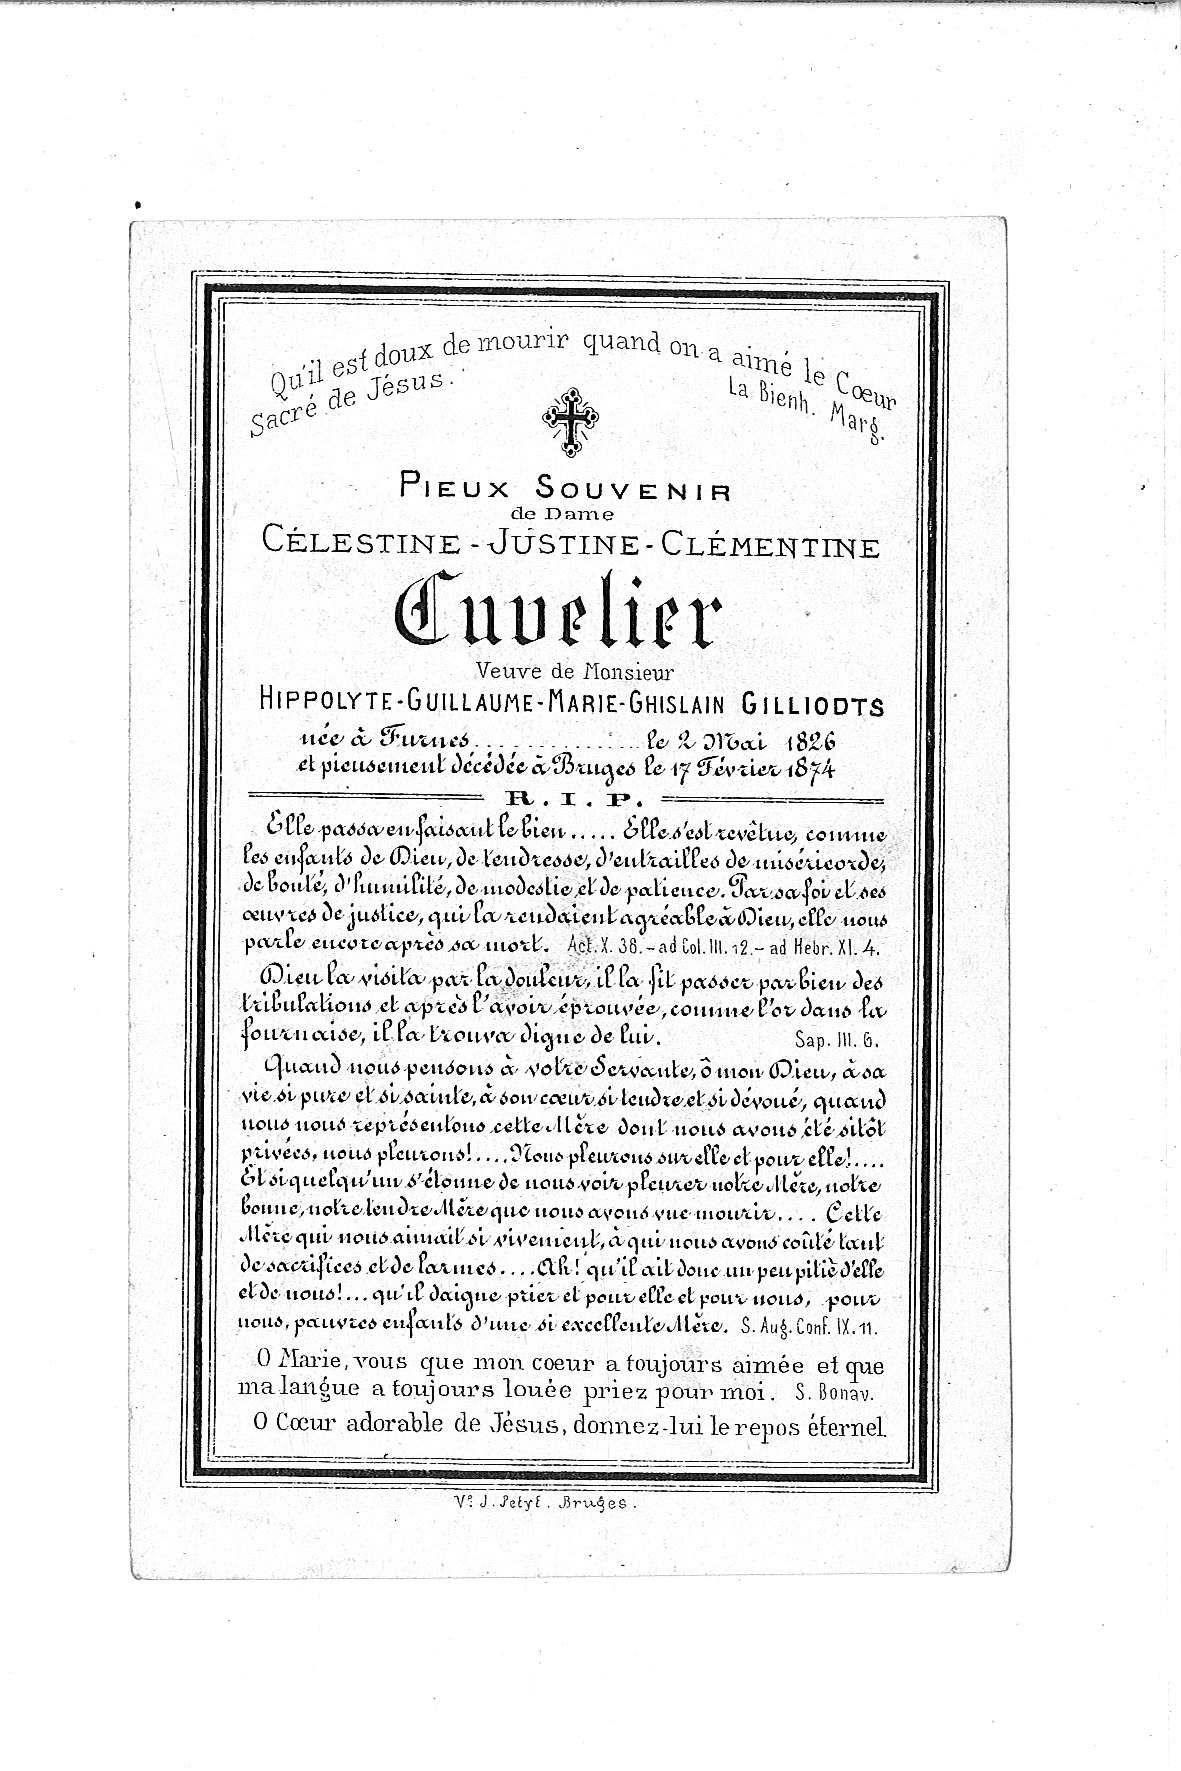 célestine-justine-clémentine(1874)20120329074916_00017.jpg